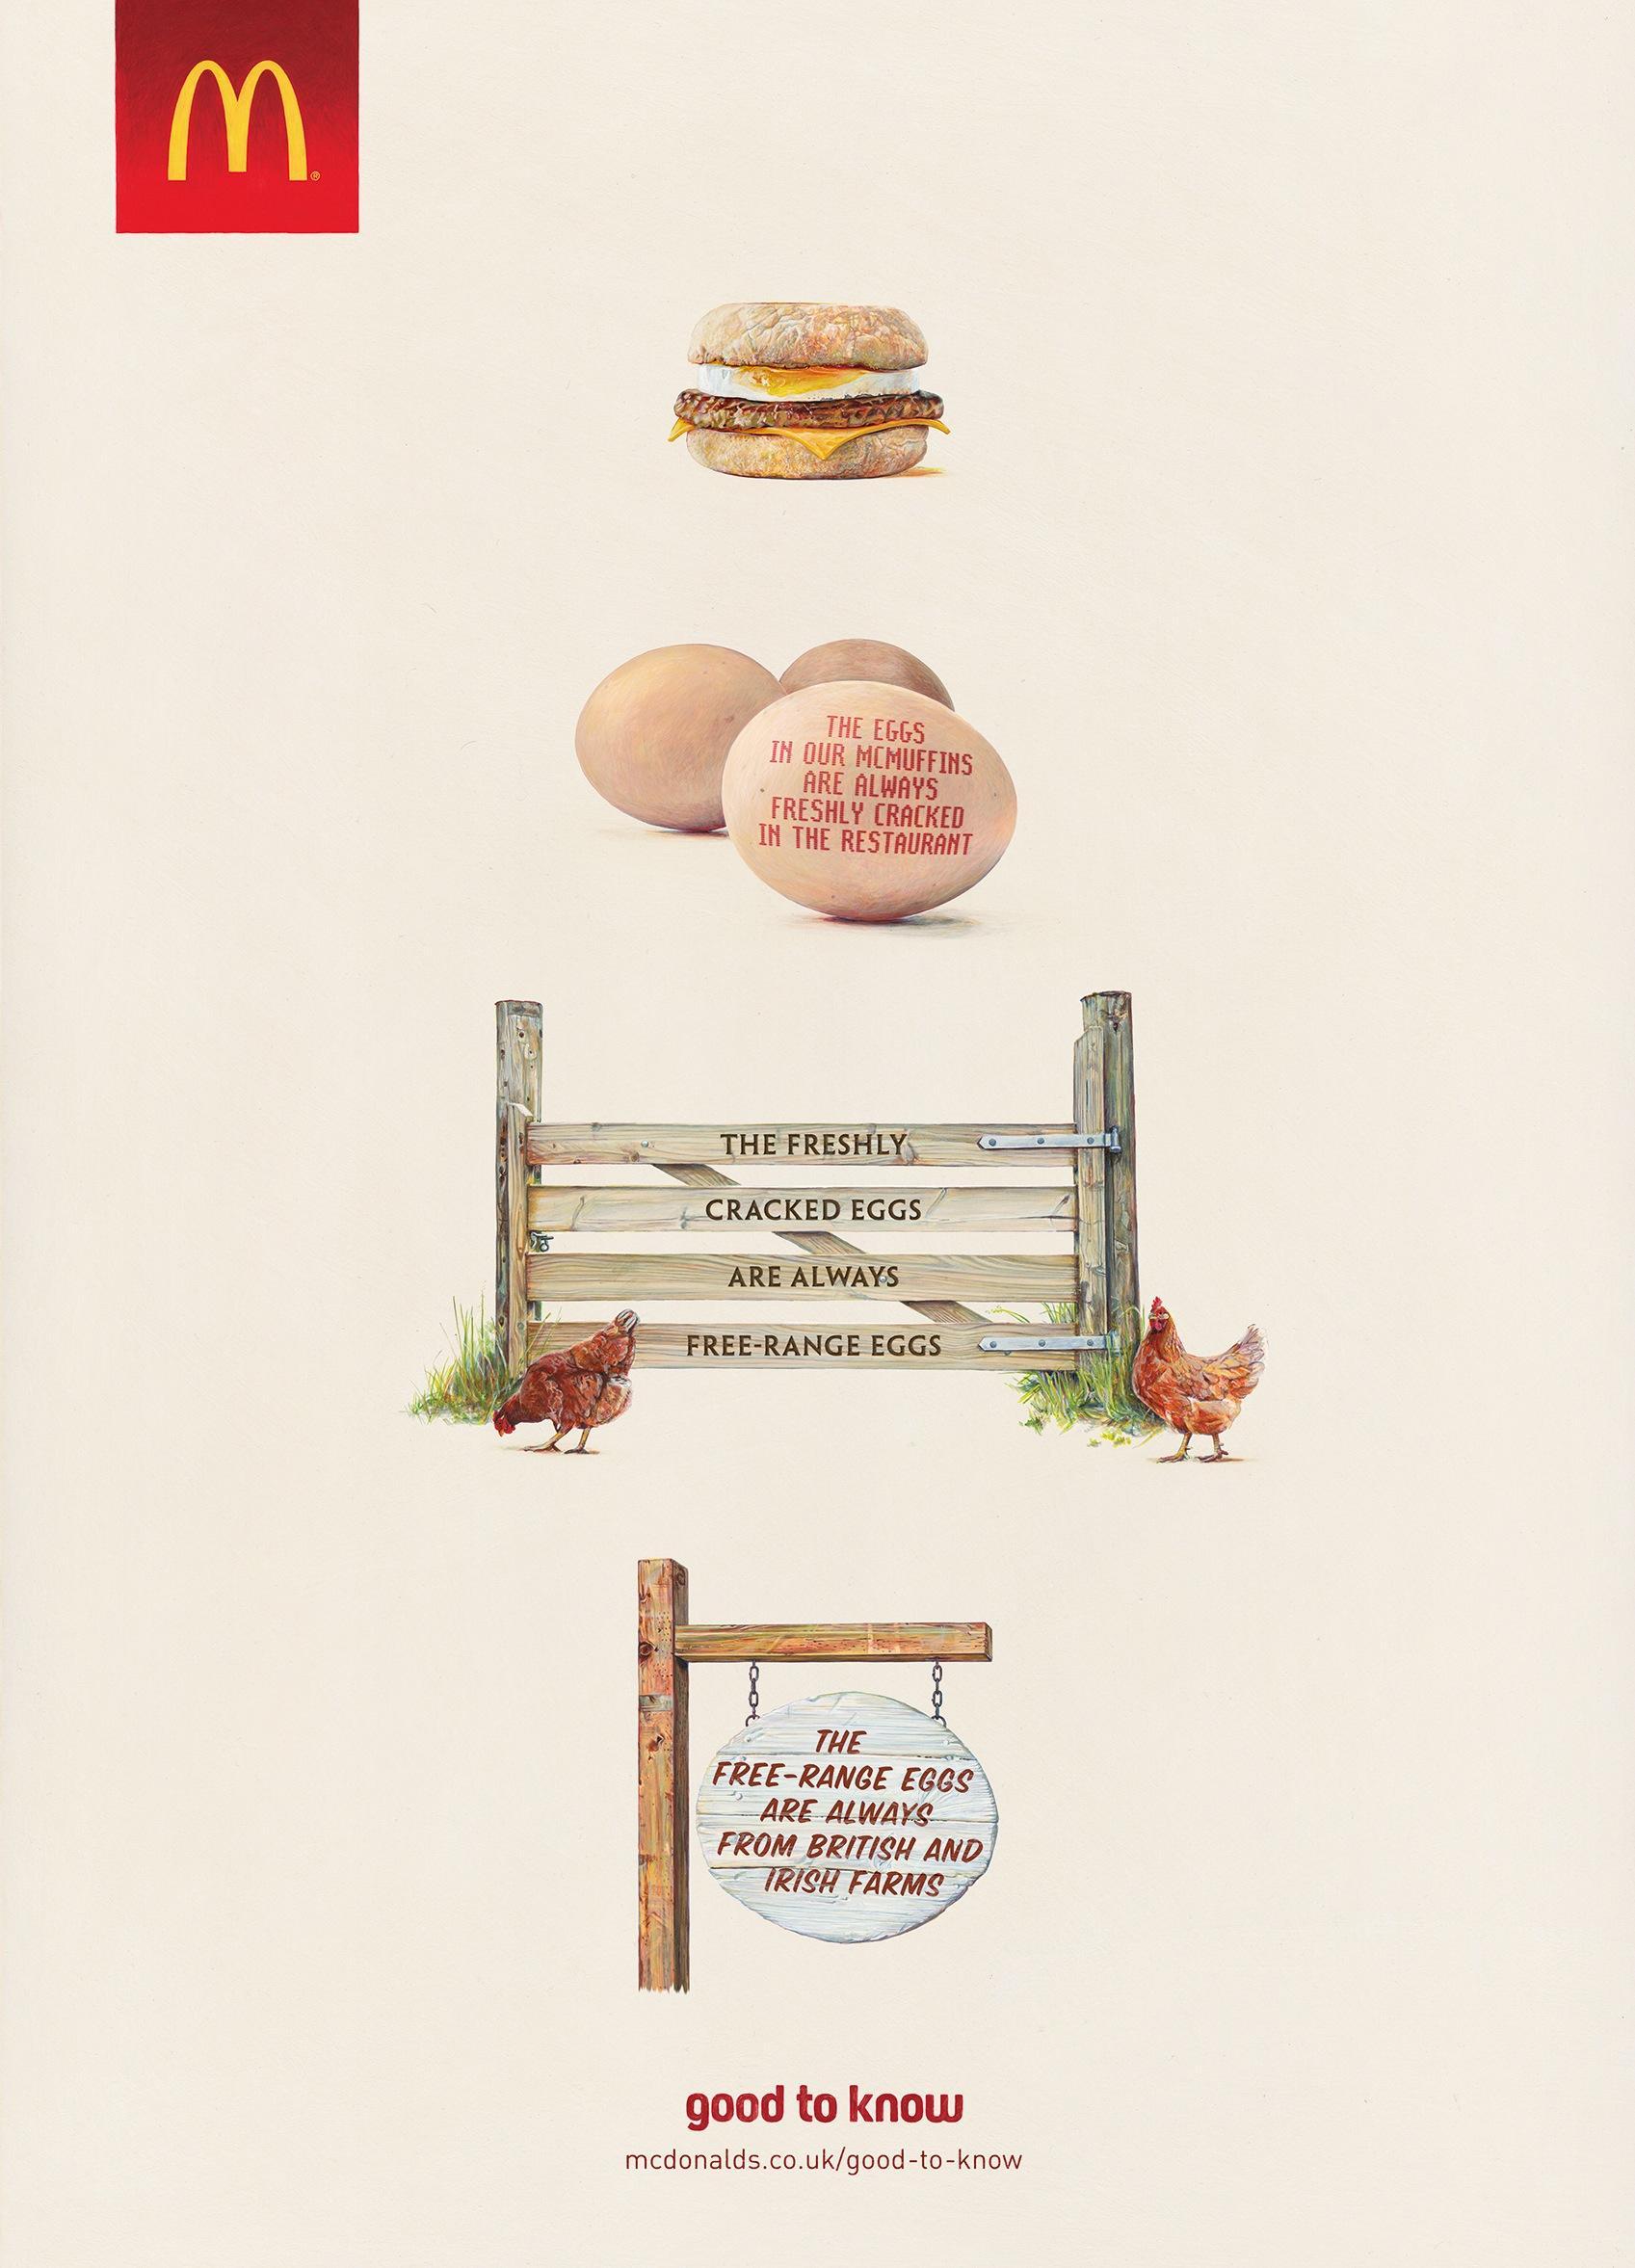 mcdonalds advertisement